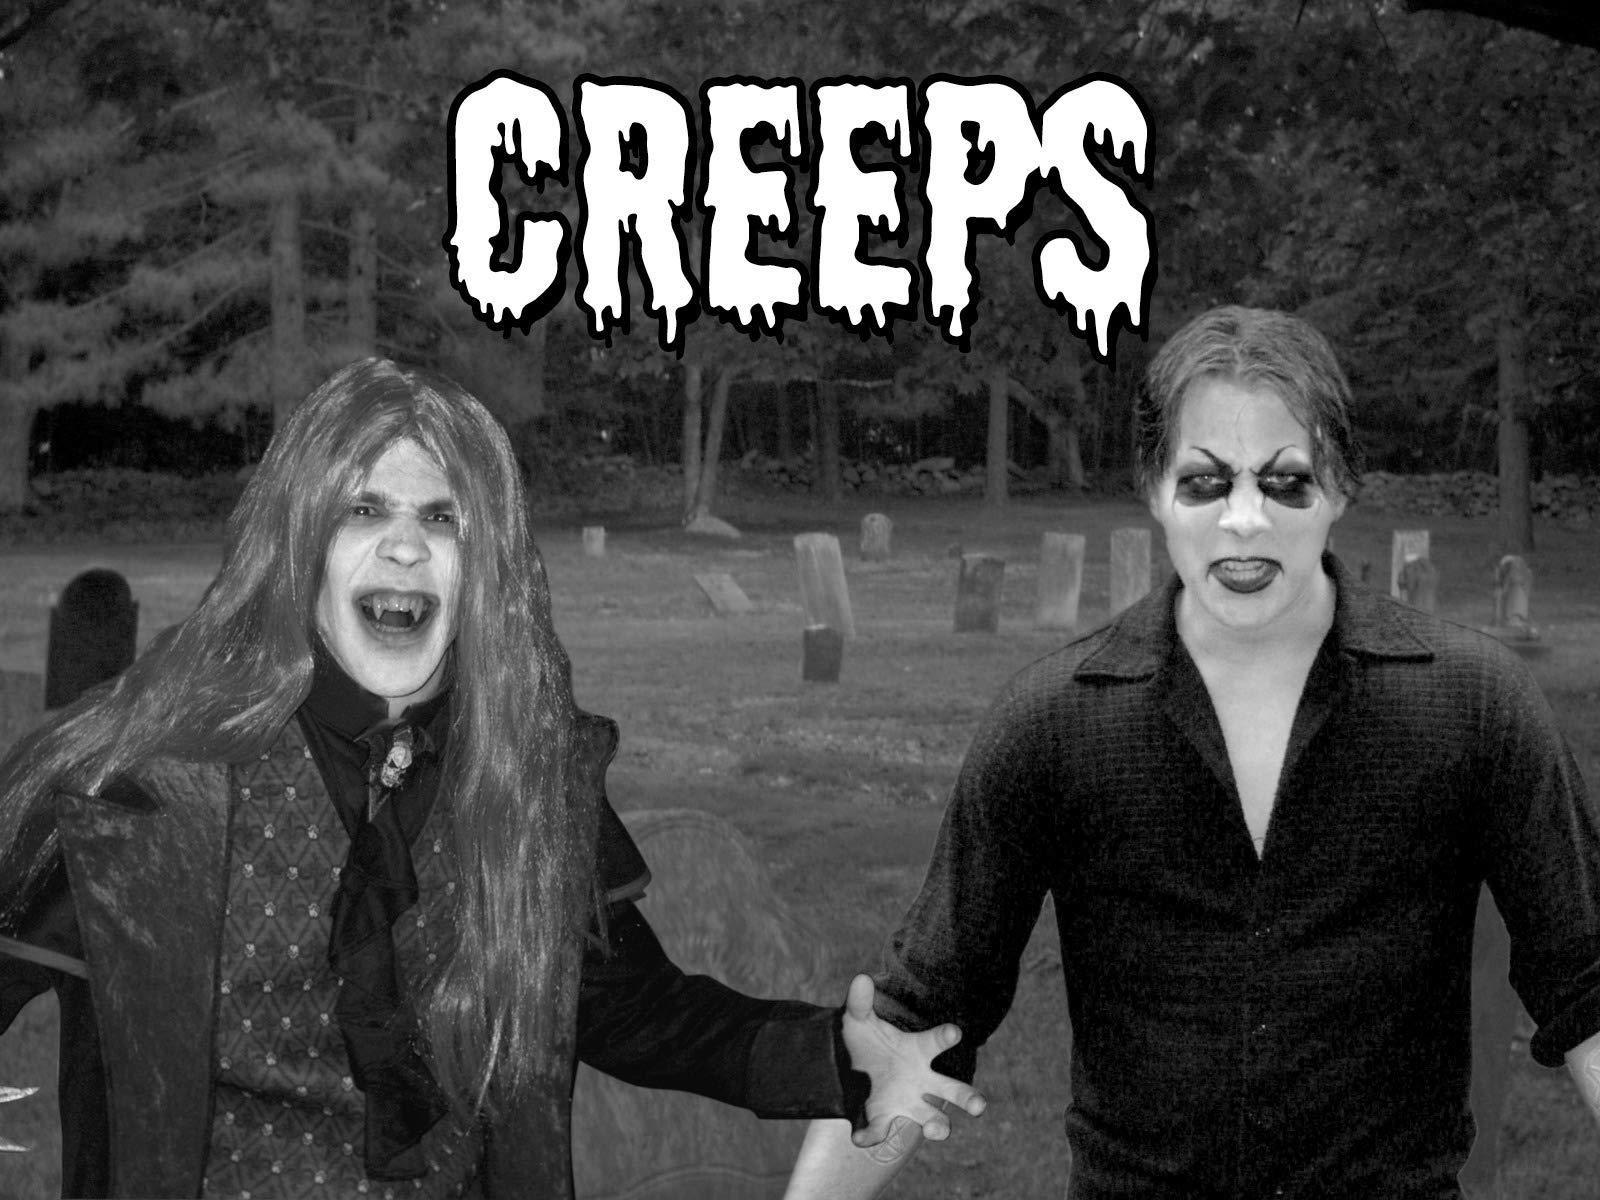 Creeps